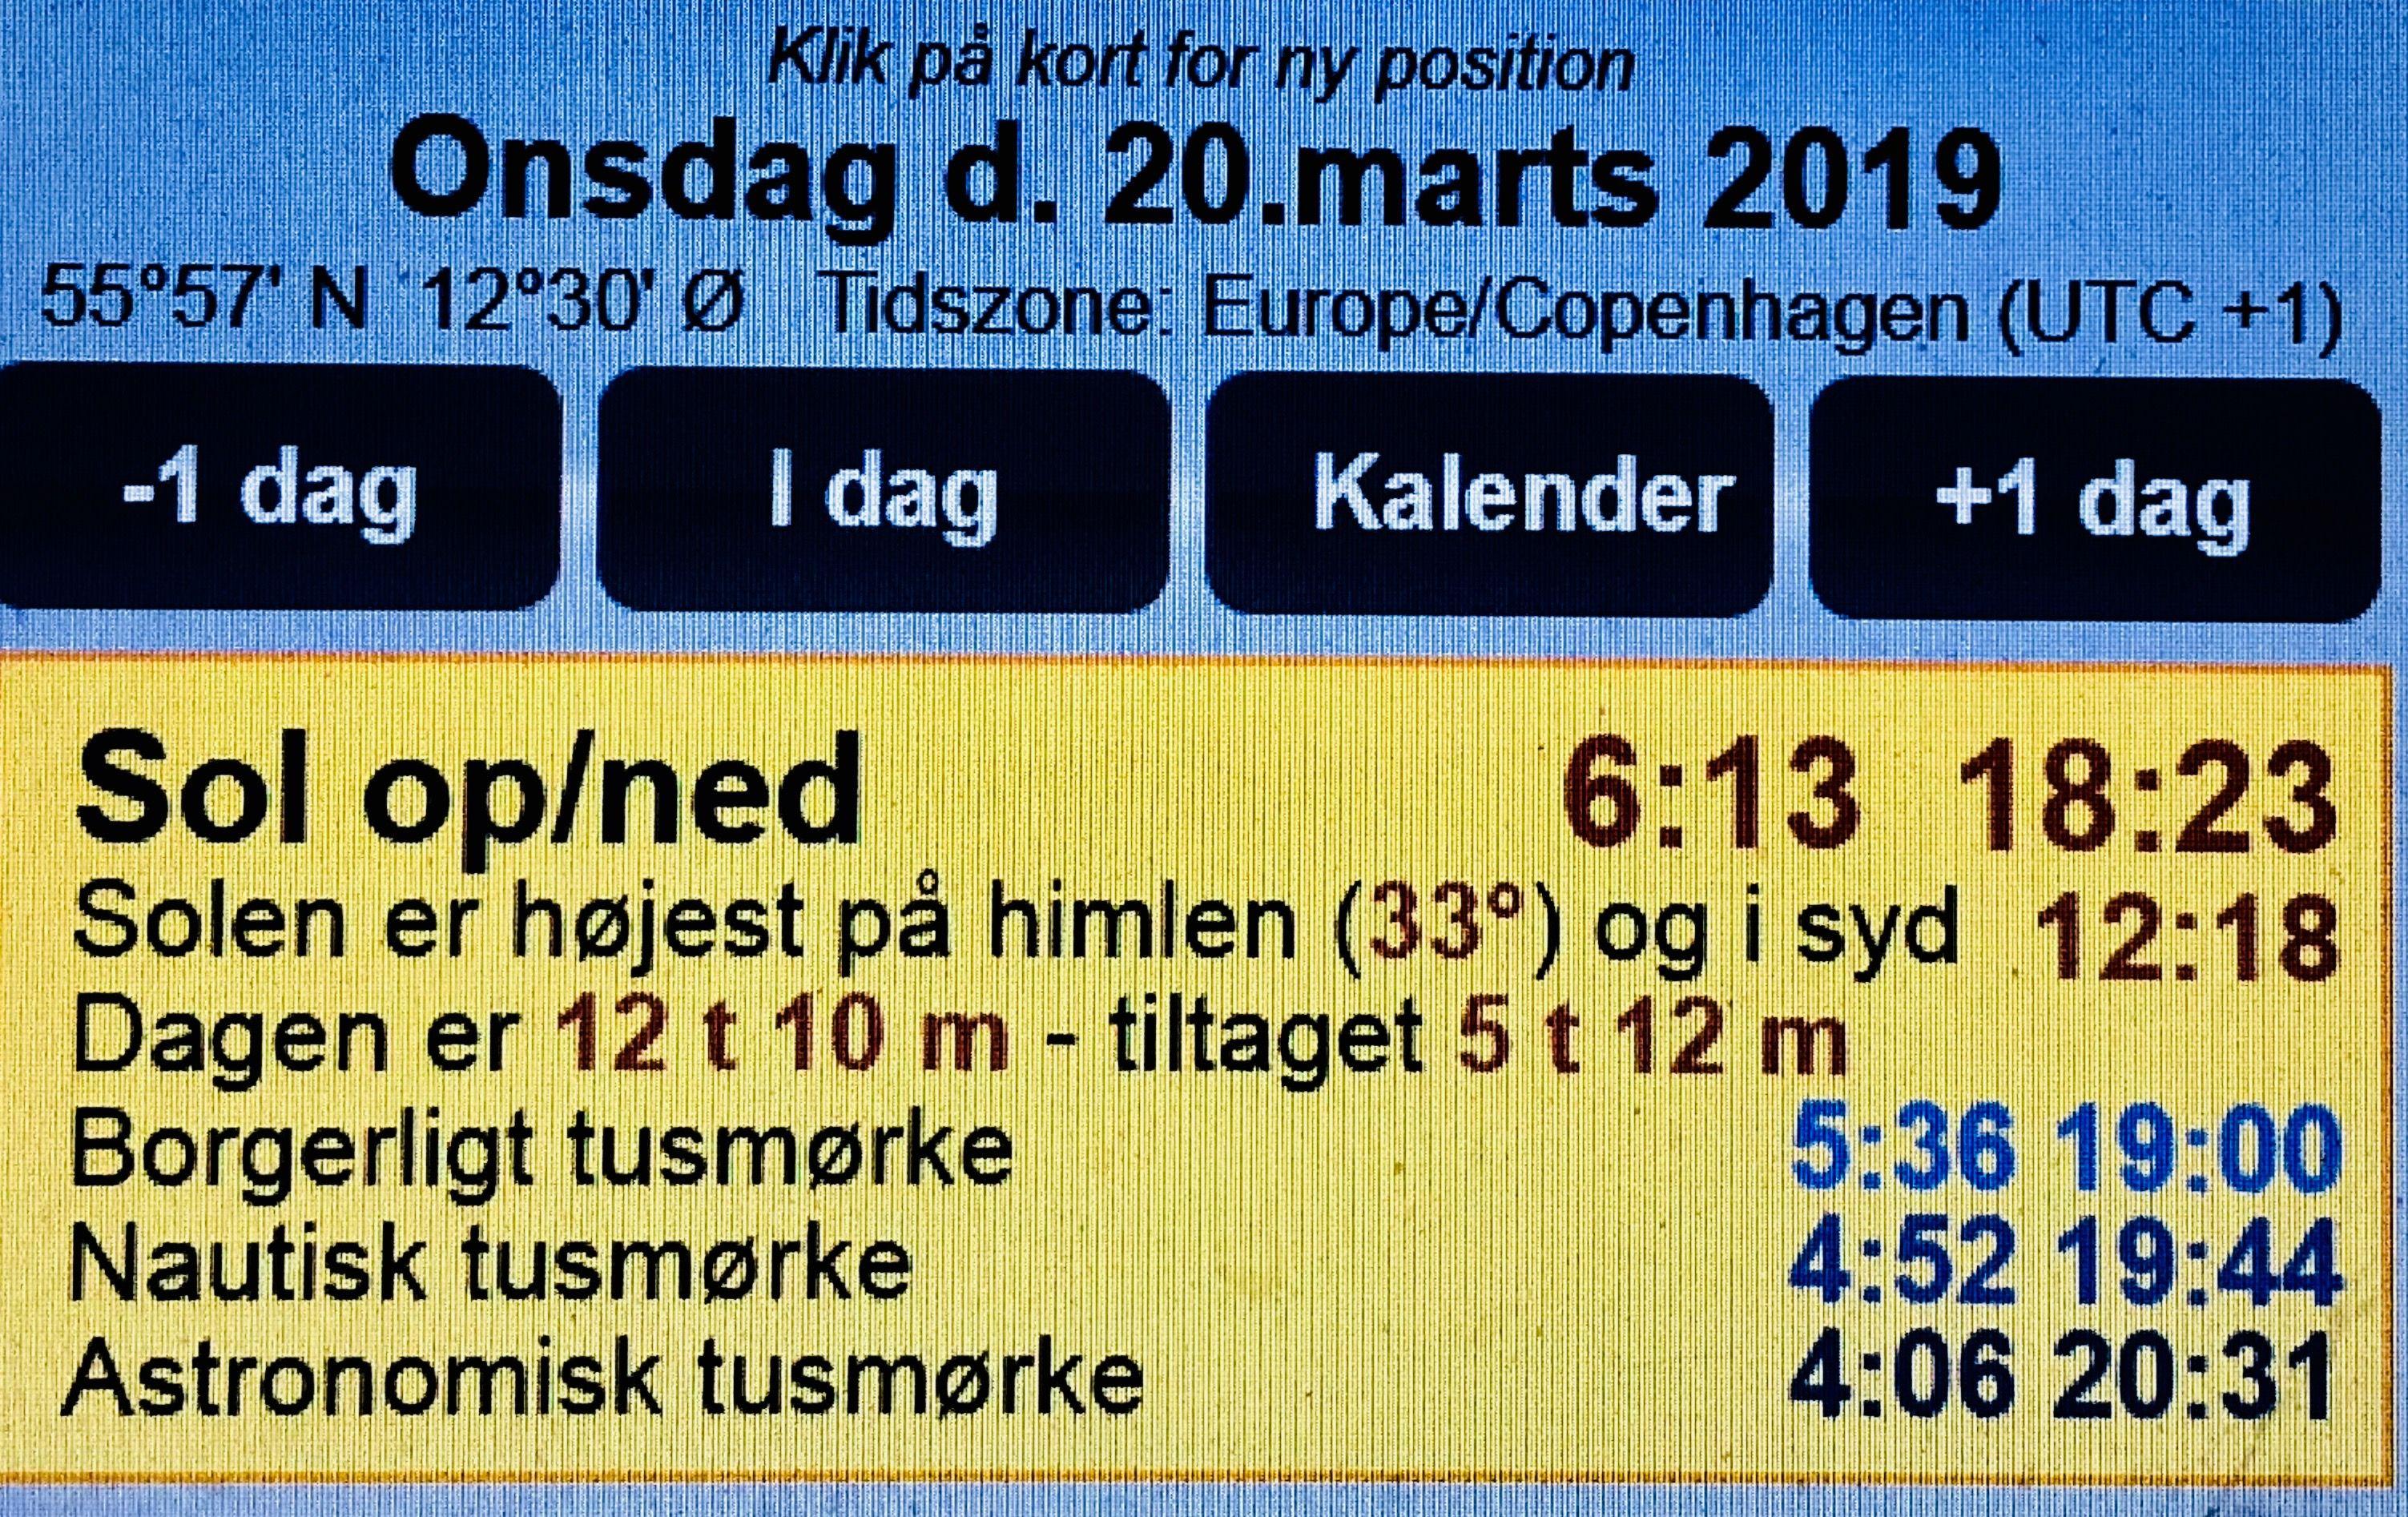 Pin Af Steffen Postmand Pa Vejr Tid Sted I 2019 Boarding Pass